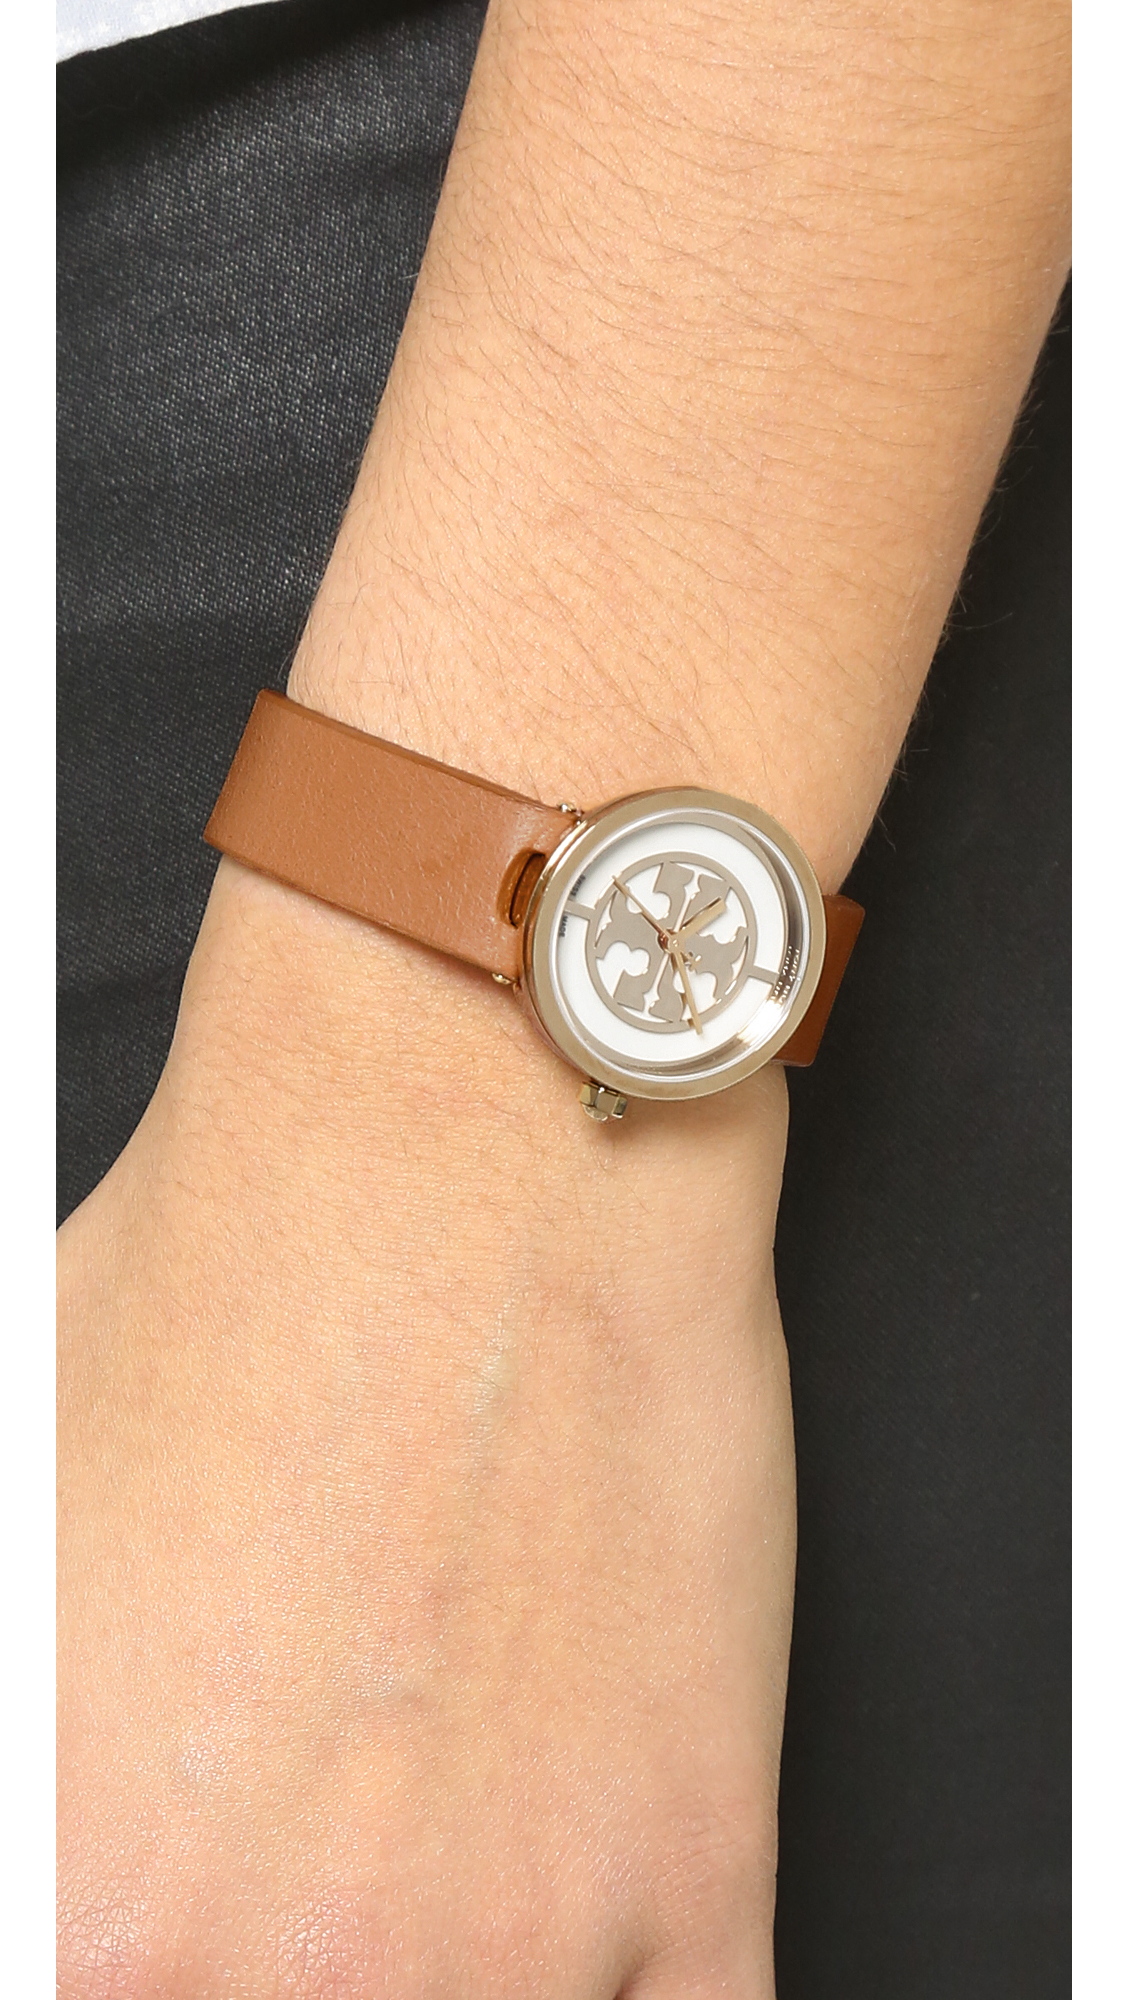 fbfbd635f Tory Burch Reva Watch in Metallic - Lyst